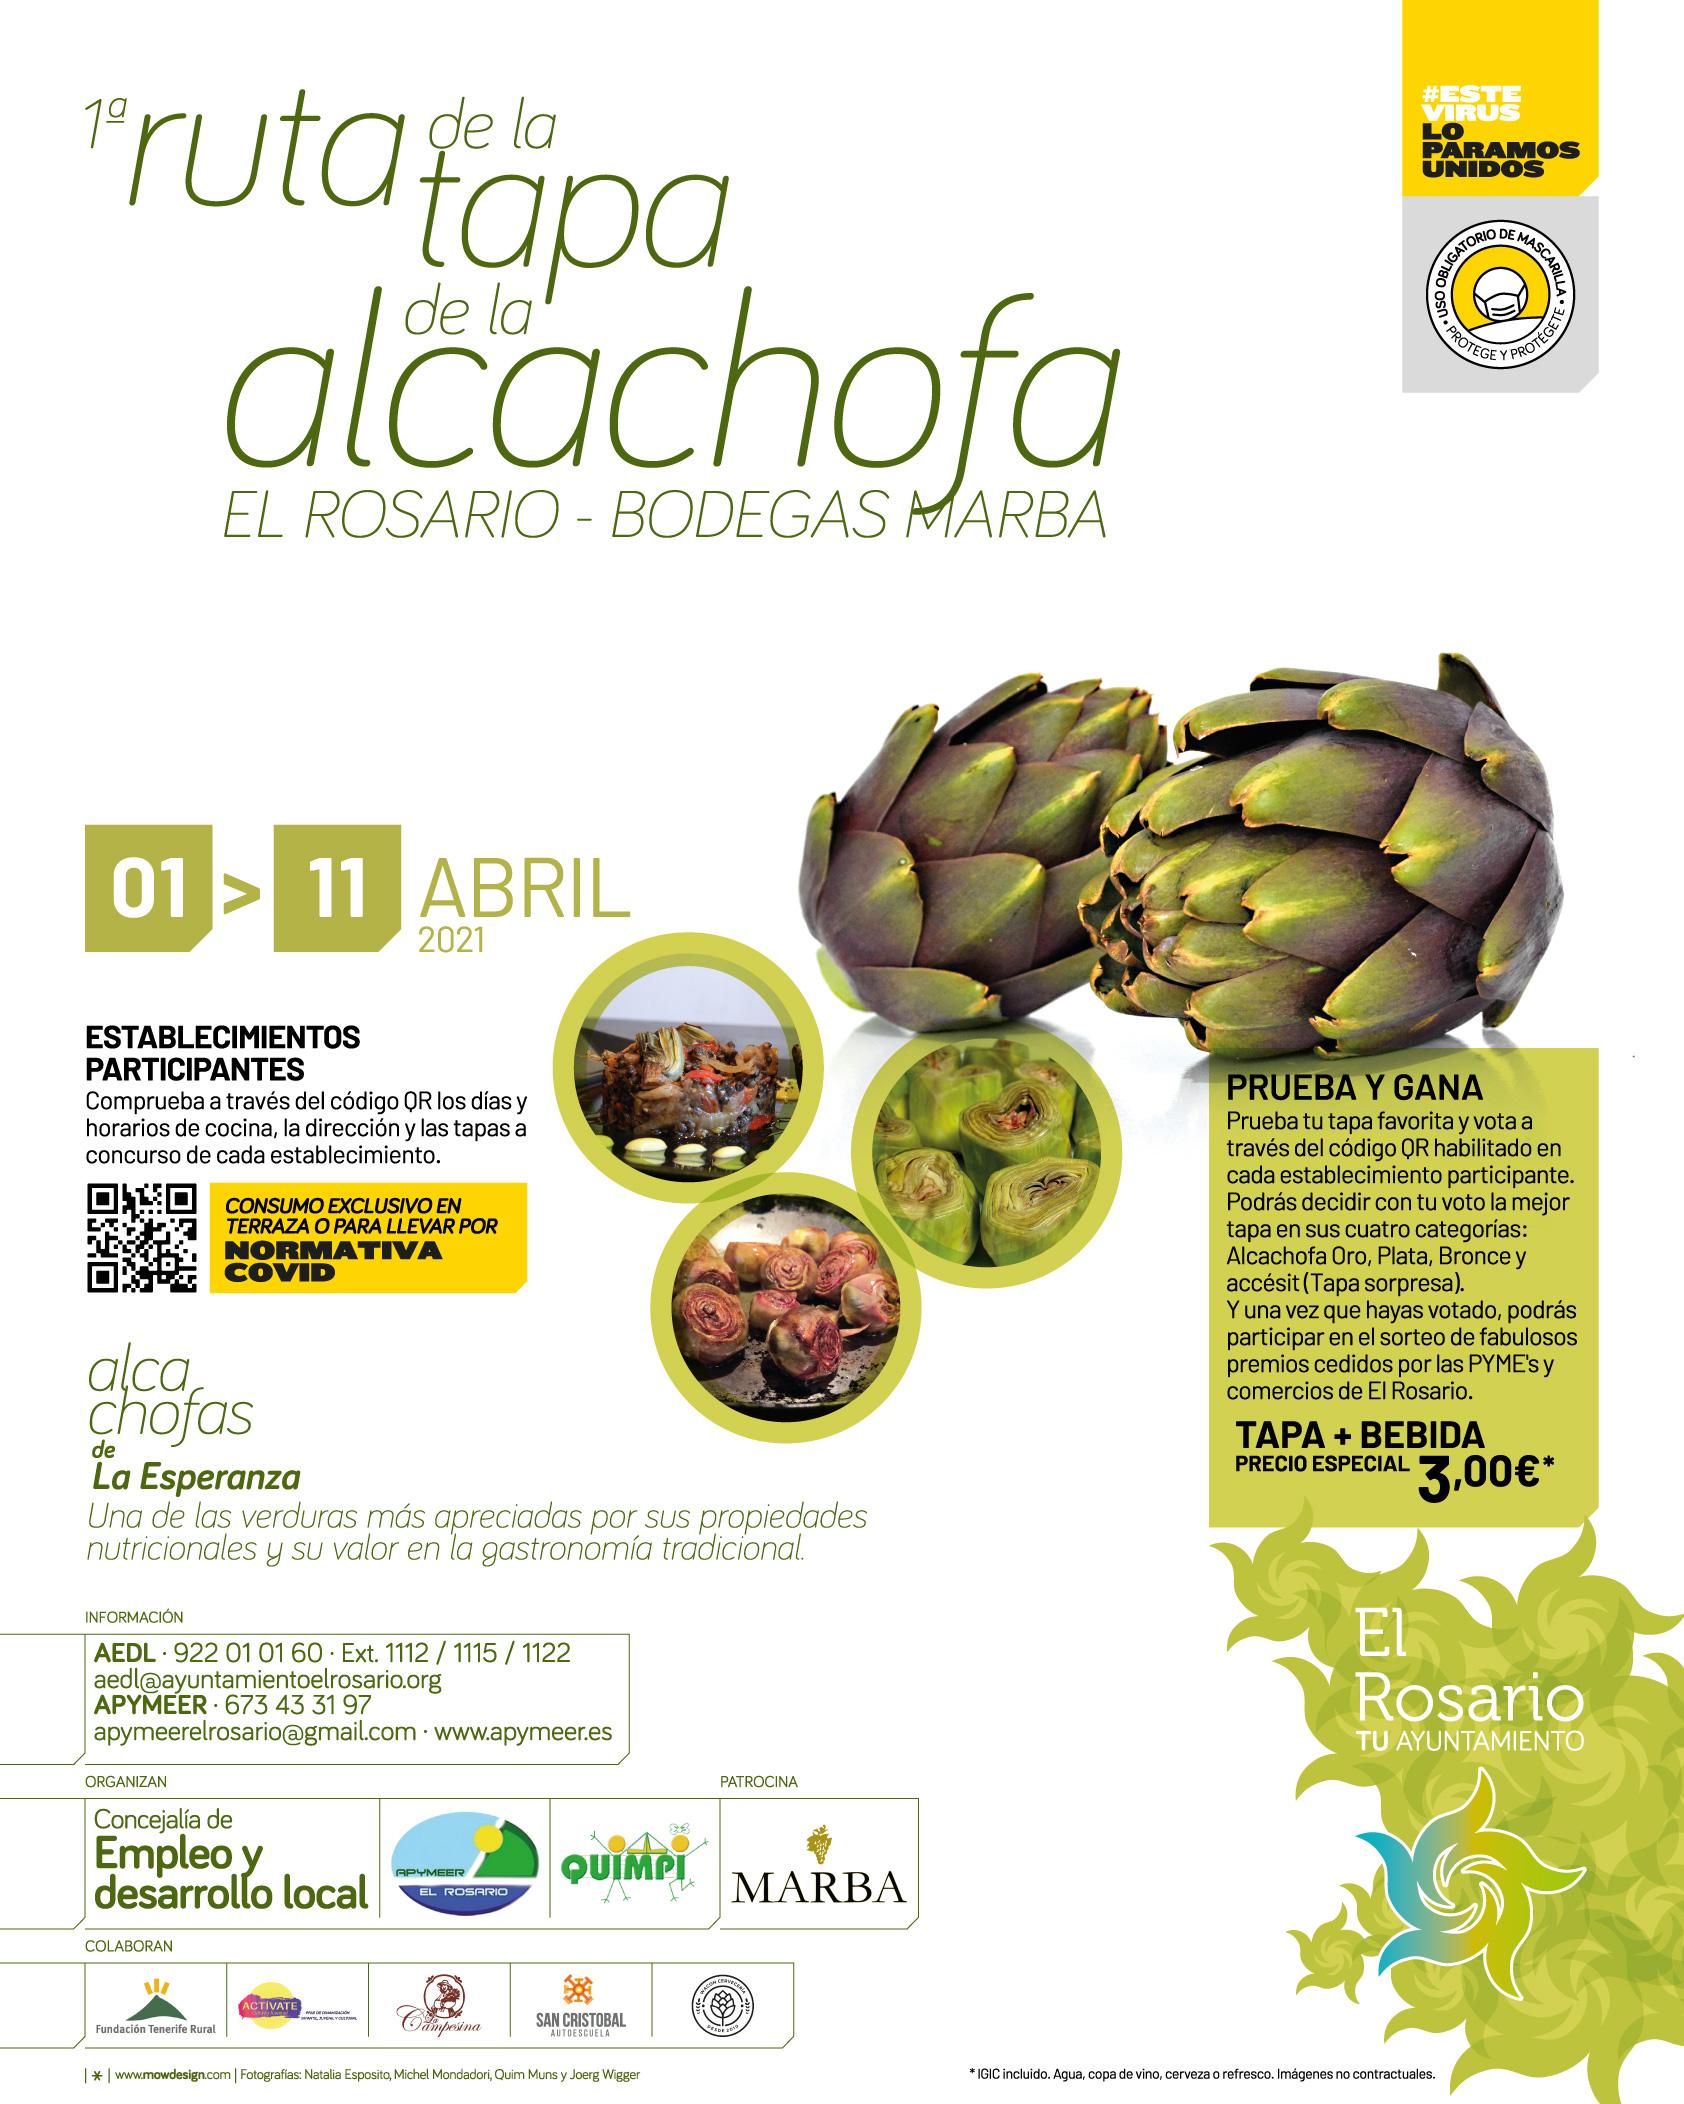 I_RUTA_TAPA_ALCACHOFAS-20210401-CARTEL_A3-20210324-02af-redes